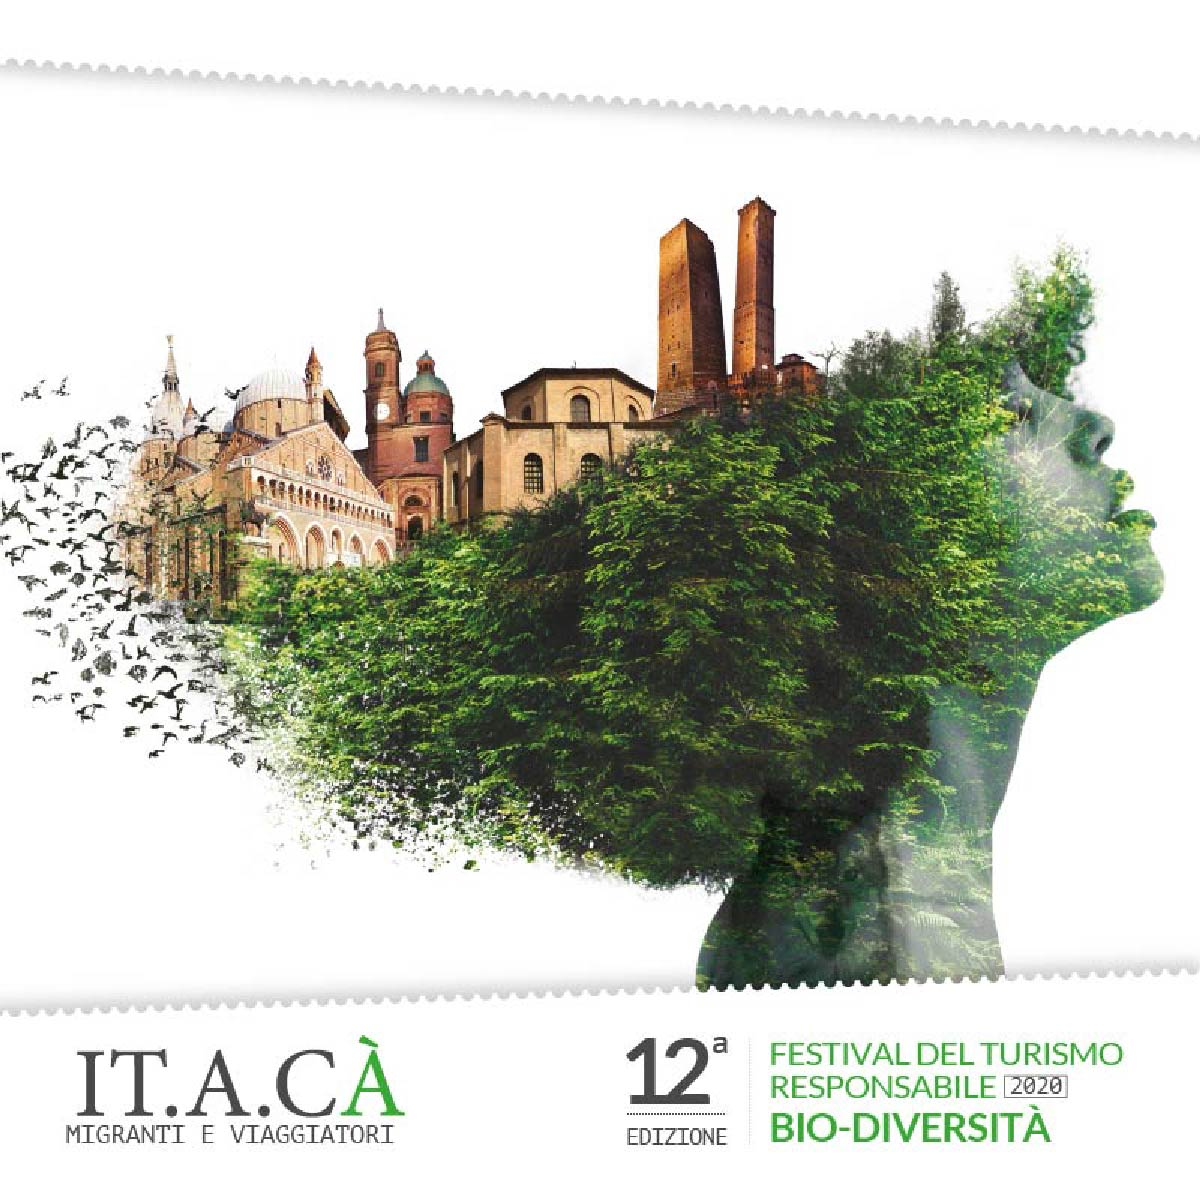 festival-itaca-strategia-eventi-turismo-sostenibile-branding-4